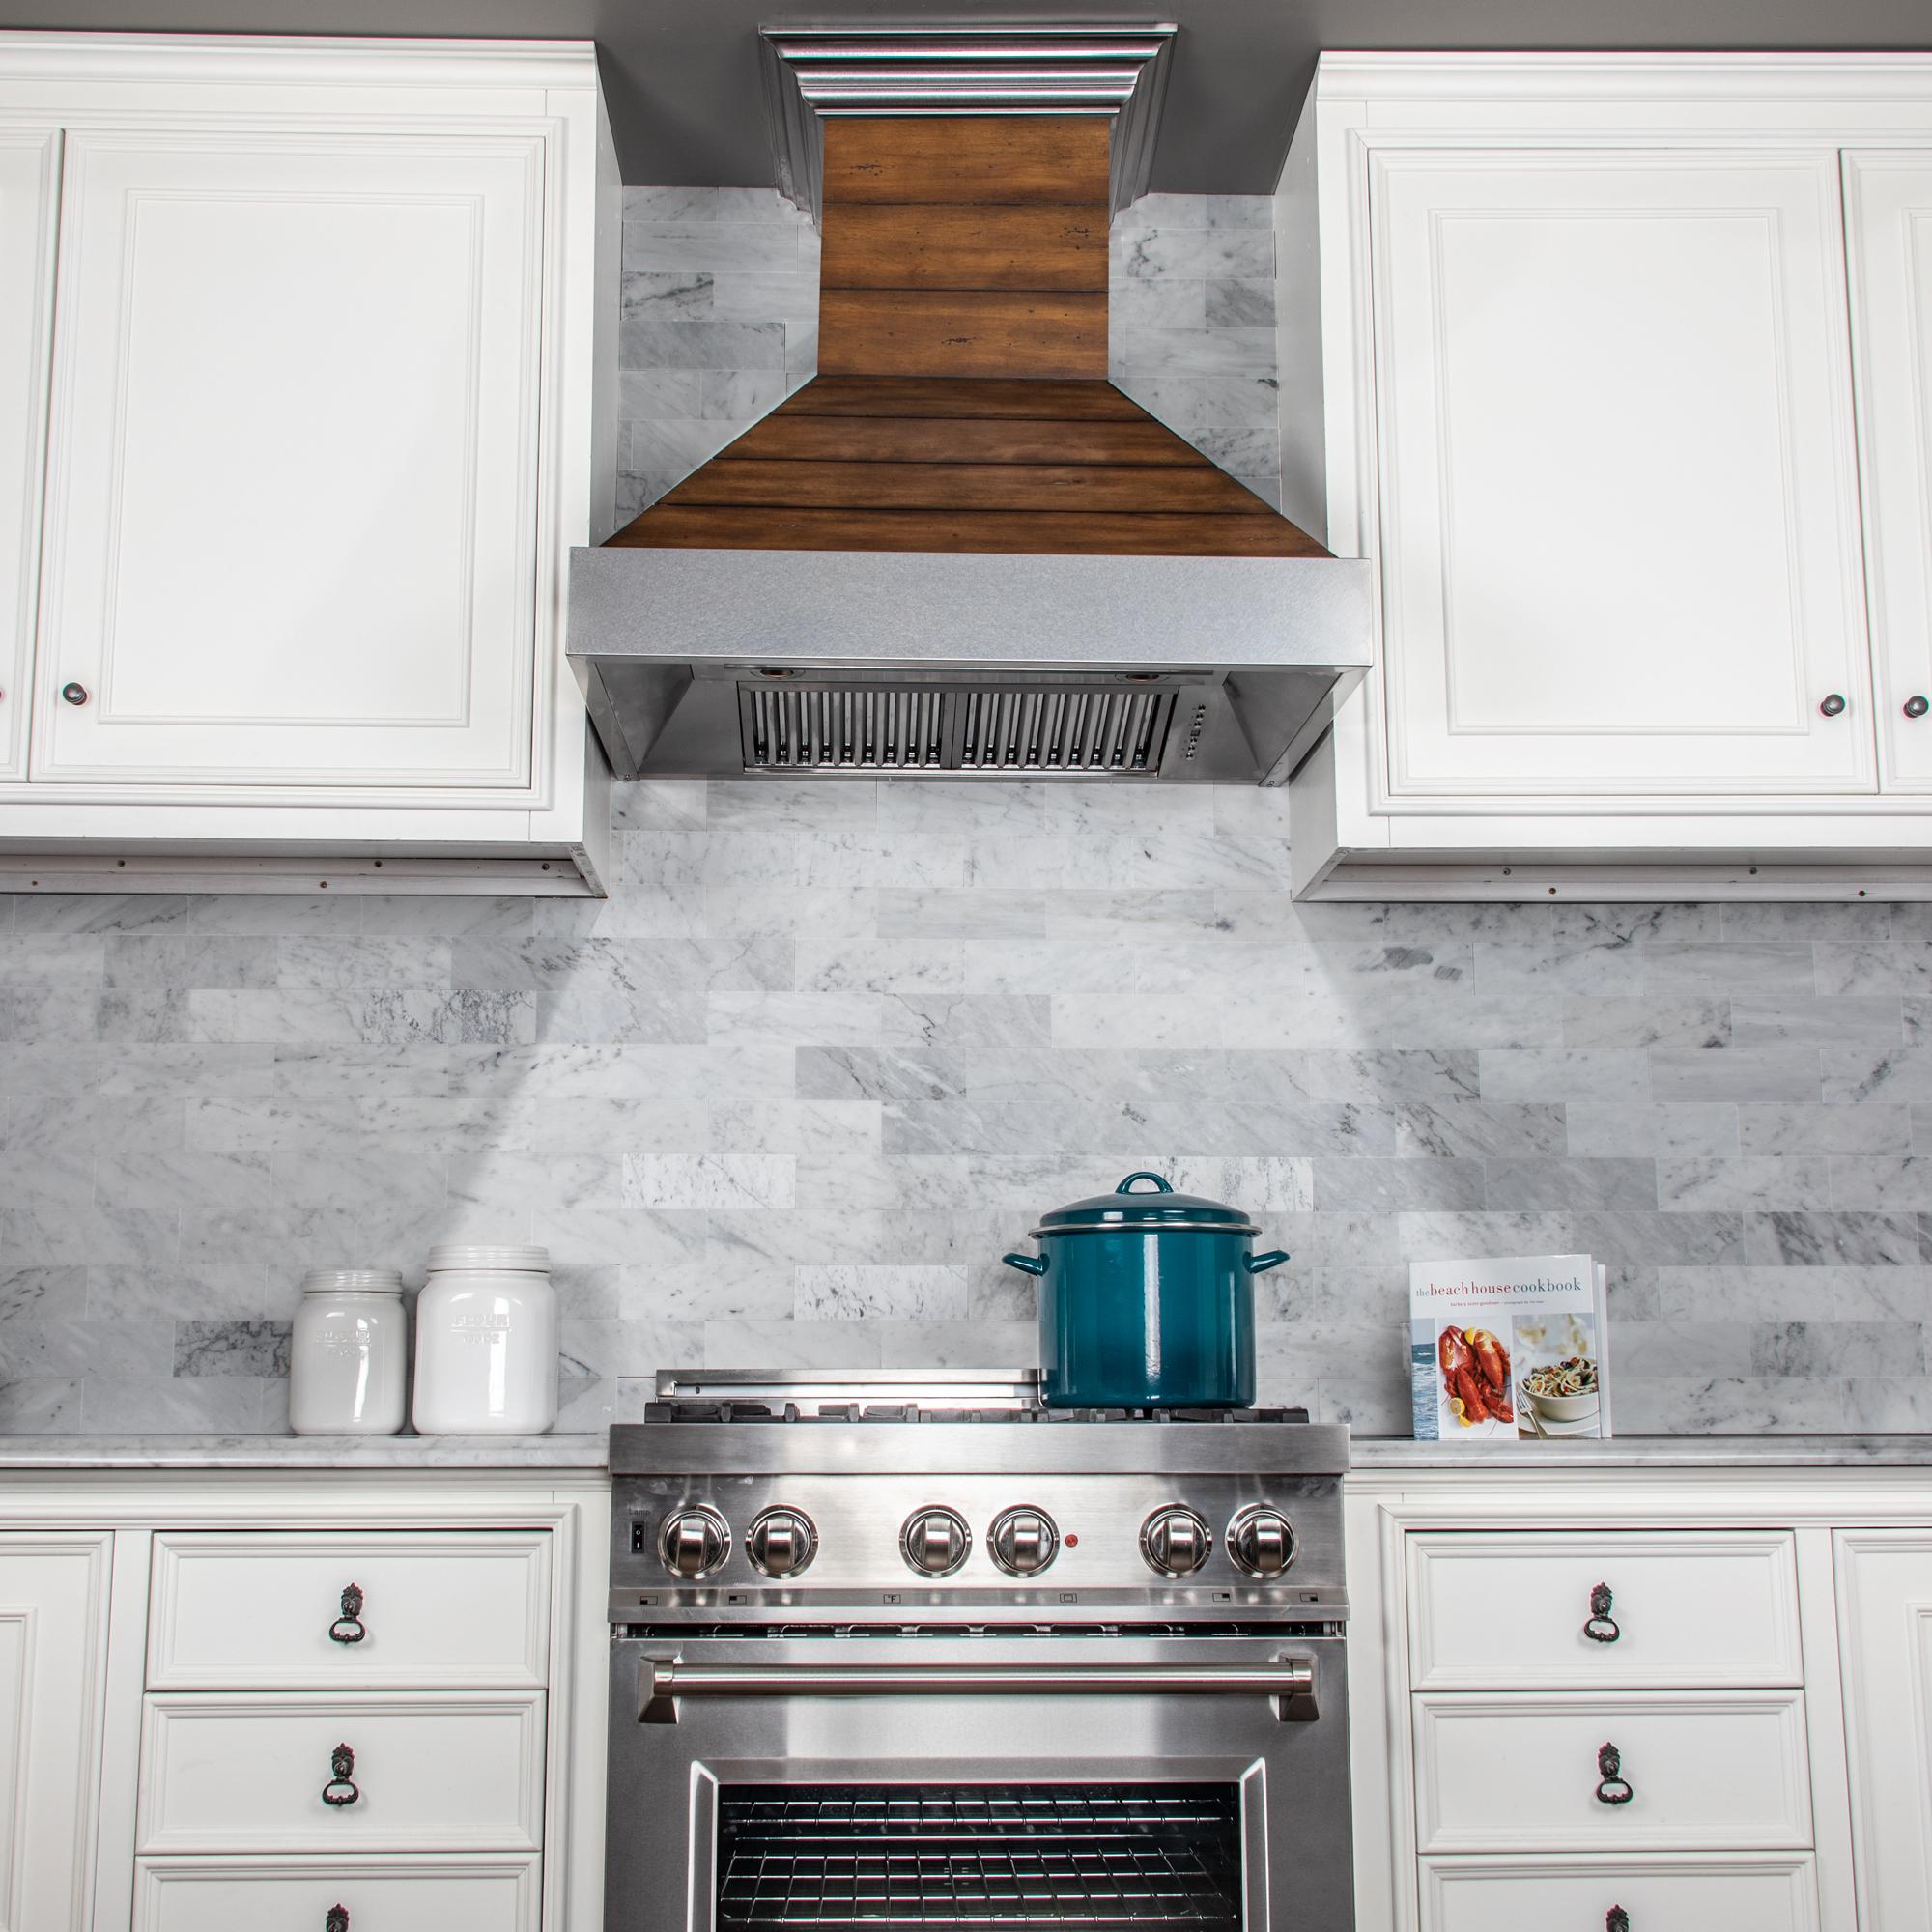 zline-designer-wood-range-hood-365BB-lifestyle1.jpg